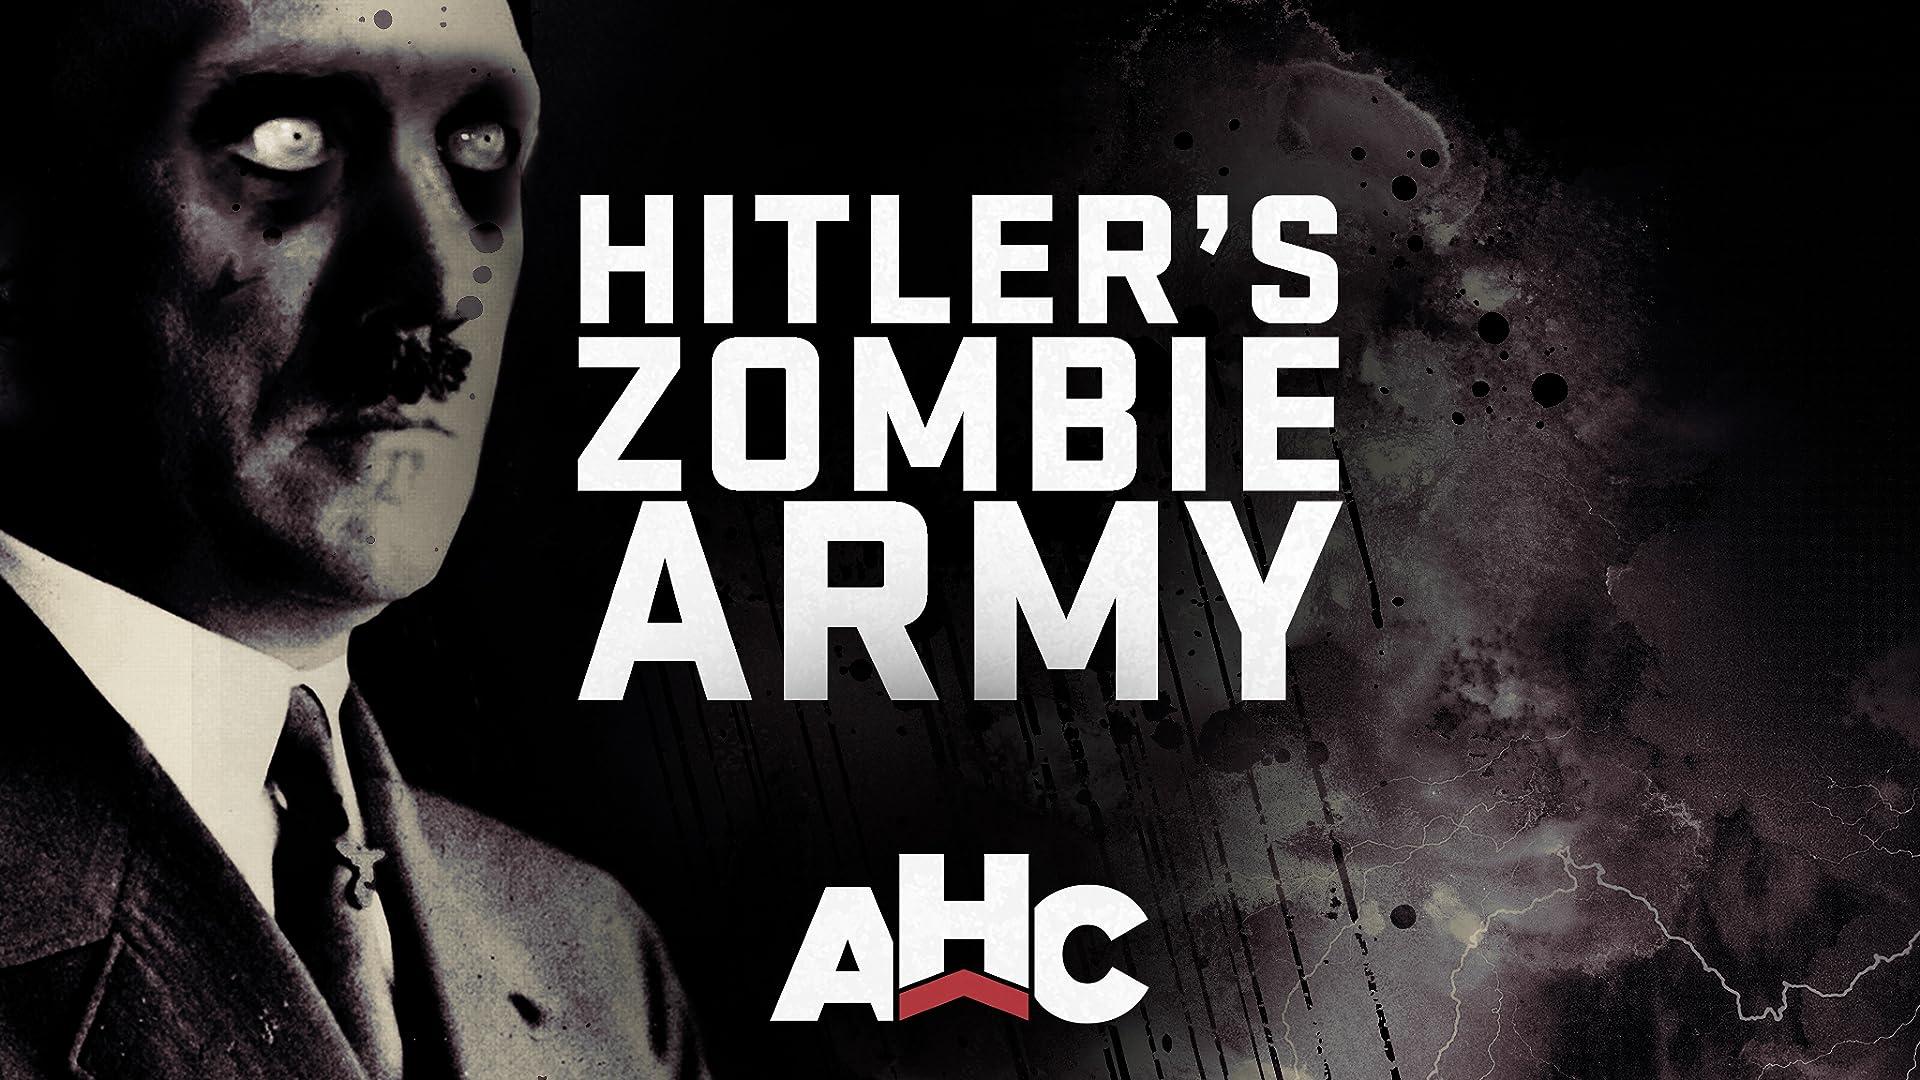 Hitler's Zombie Army - Season 1